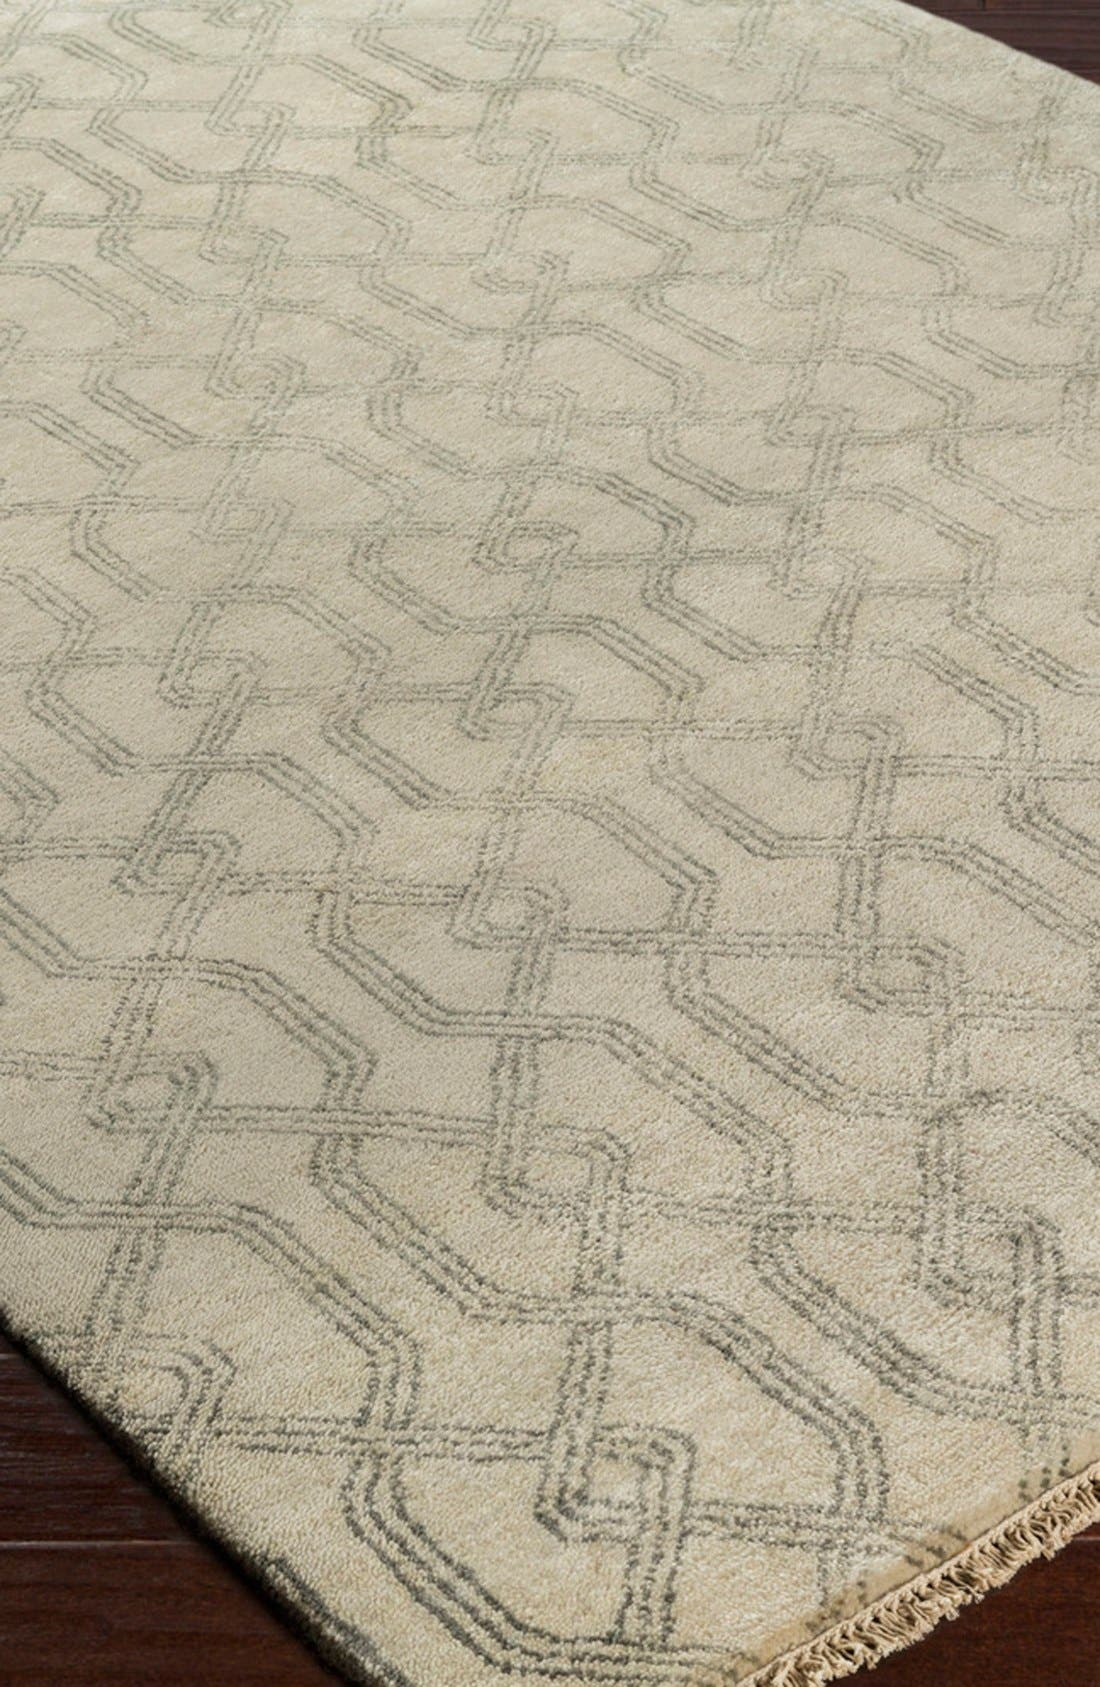 'Stanton' Wool & Cotton Rug,                             Alternate thumbnail 4, color,                             020